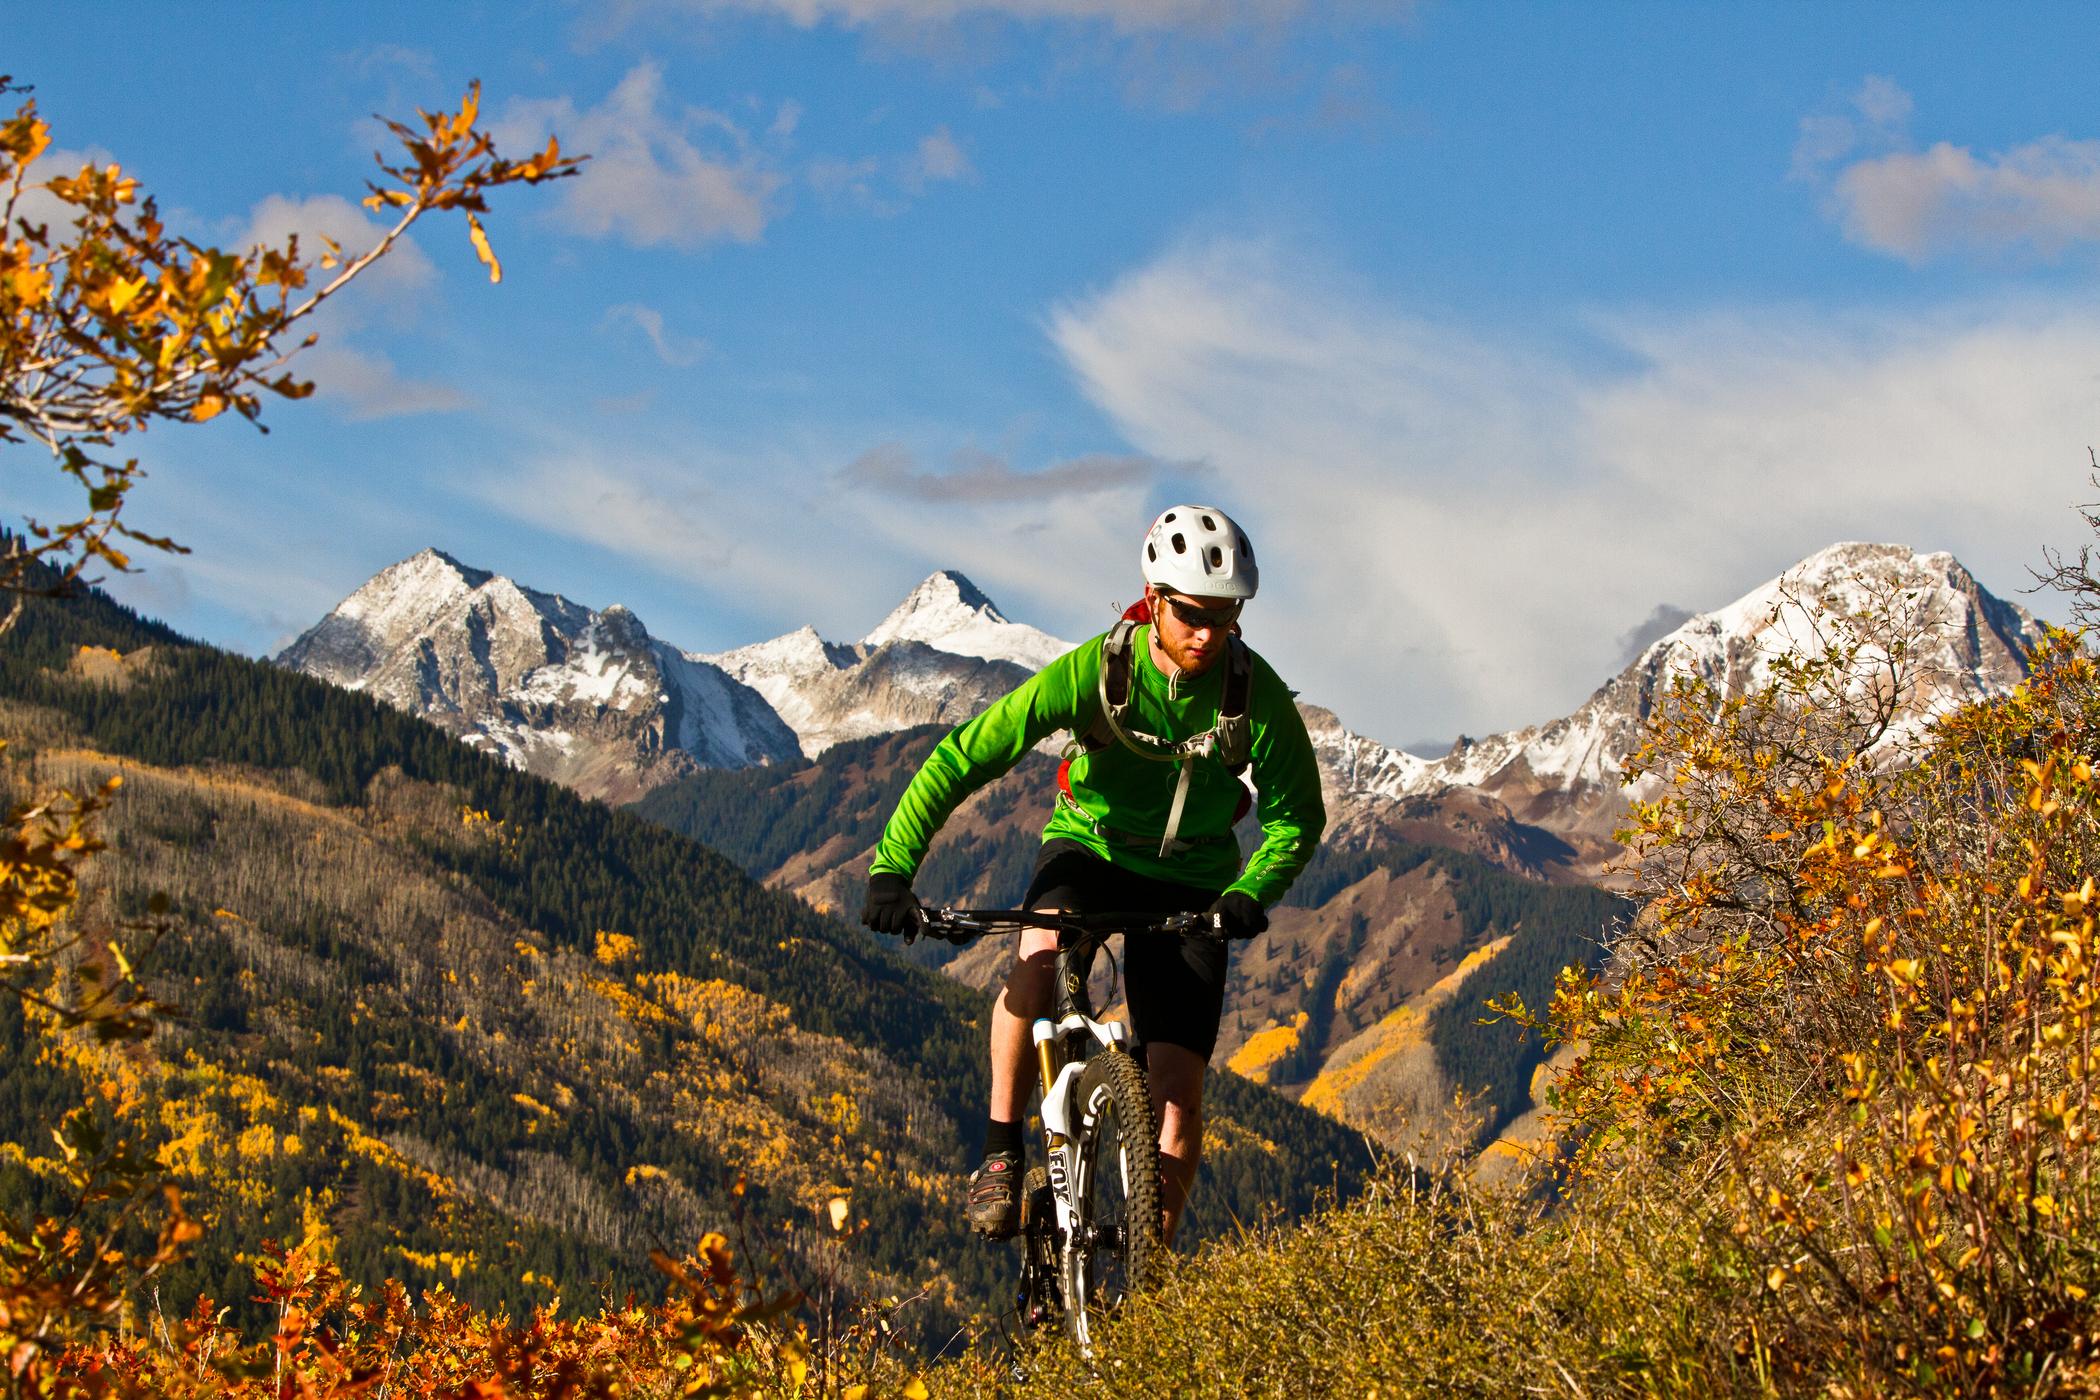 026e512a081 Aspen Snowmass designated IMBA Ride Center at Bronze Level! - Roaring Fork Mountain  Bike Association (RFMBA)